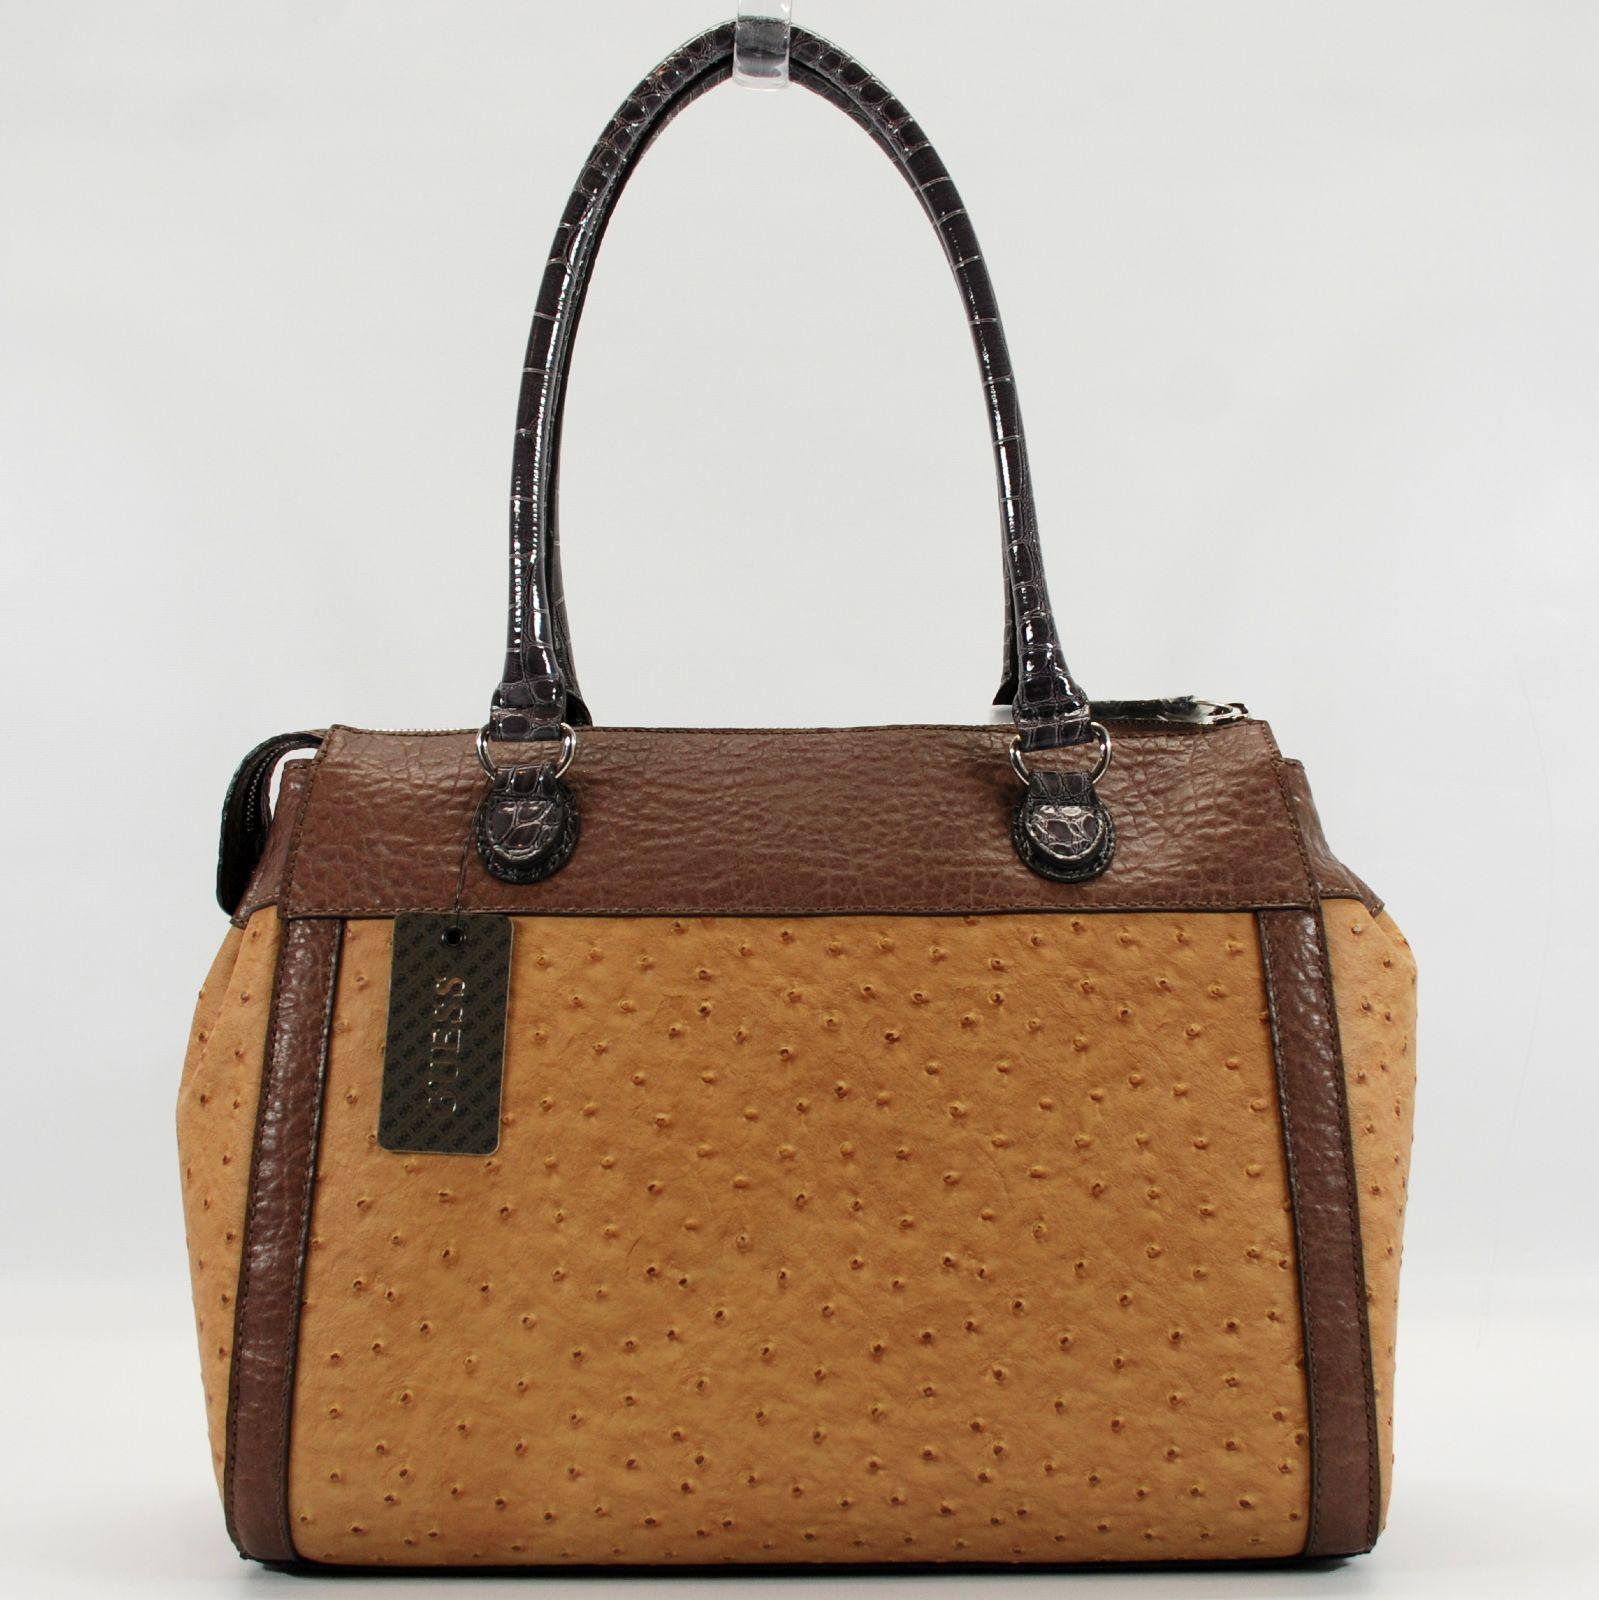 GUESS Authentic Agatha Cognac Multi Bag Handbag Travel Tote Purse  c1539ce7d5f3